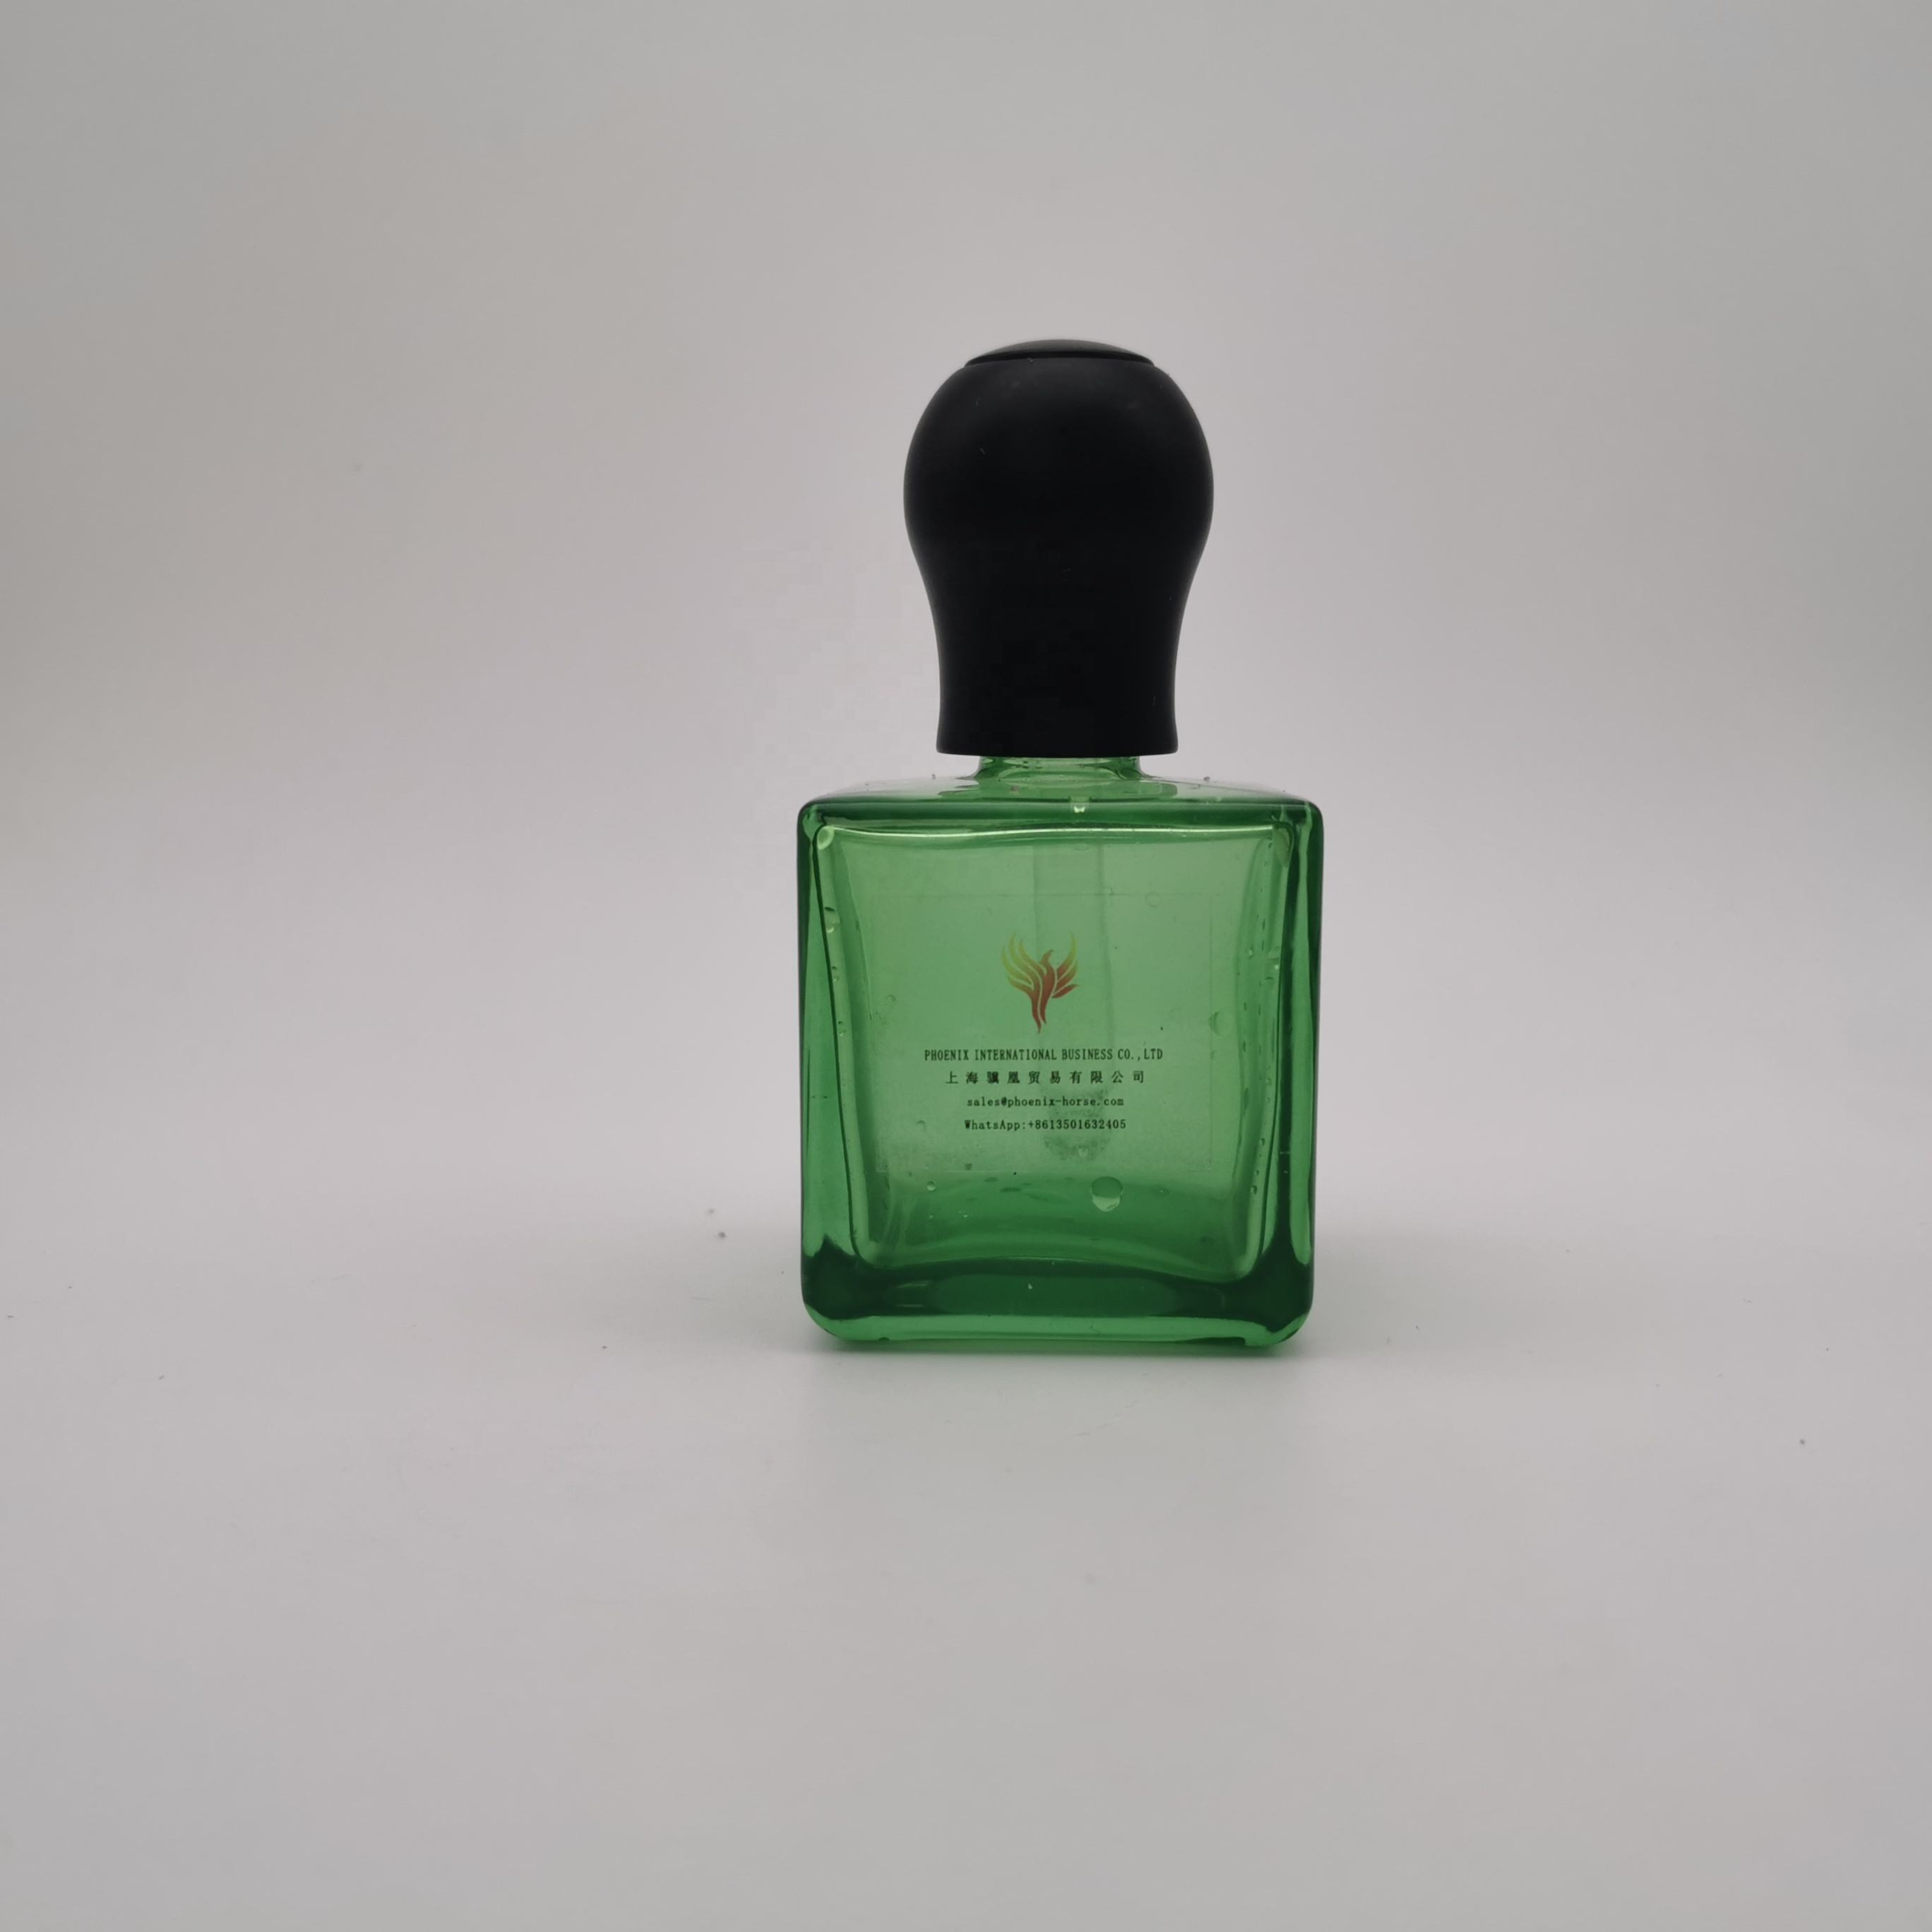 Phoenix pacote 65ml bomba de garrafa de embalagens de spray de vidro transparente frasco de perfume do corpo